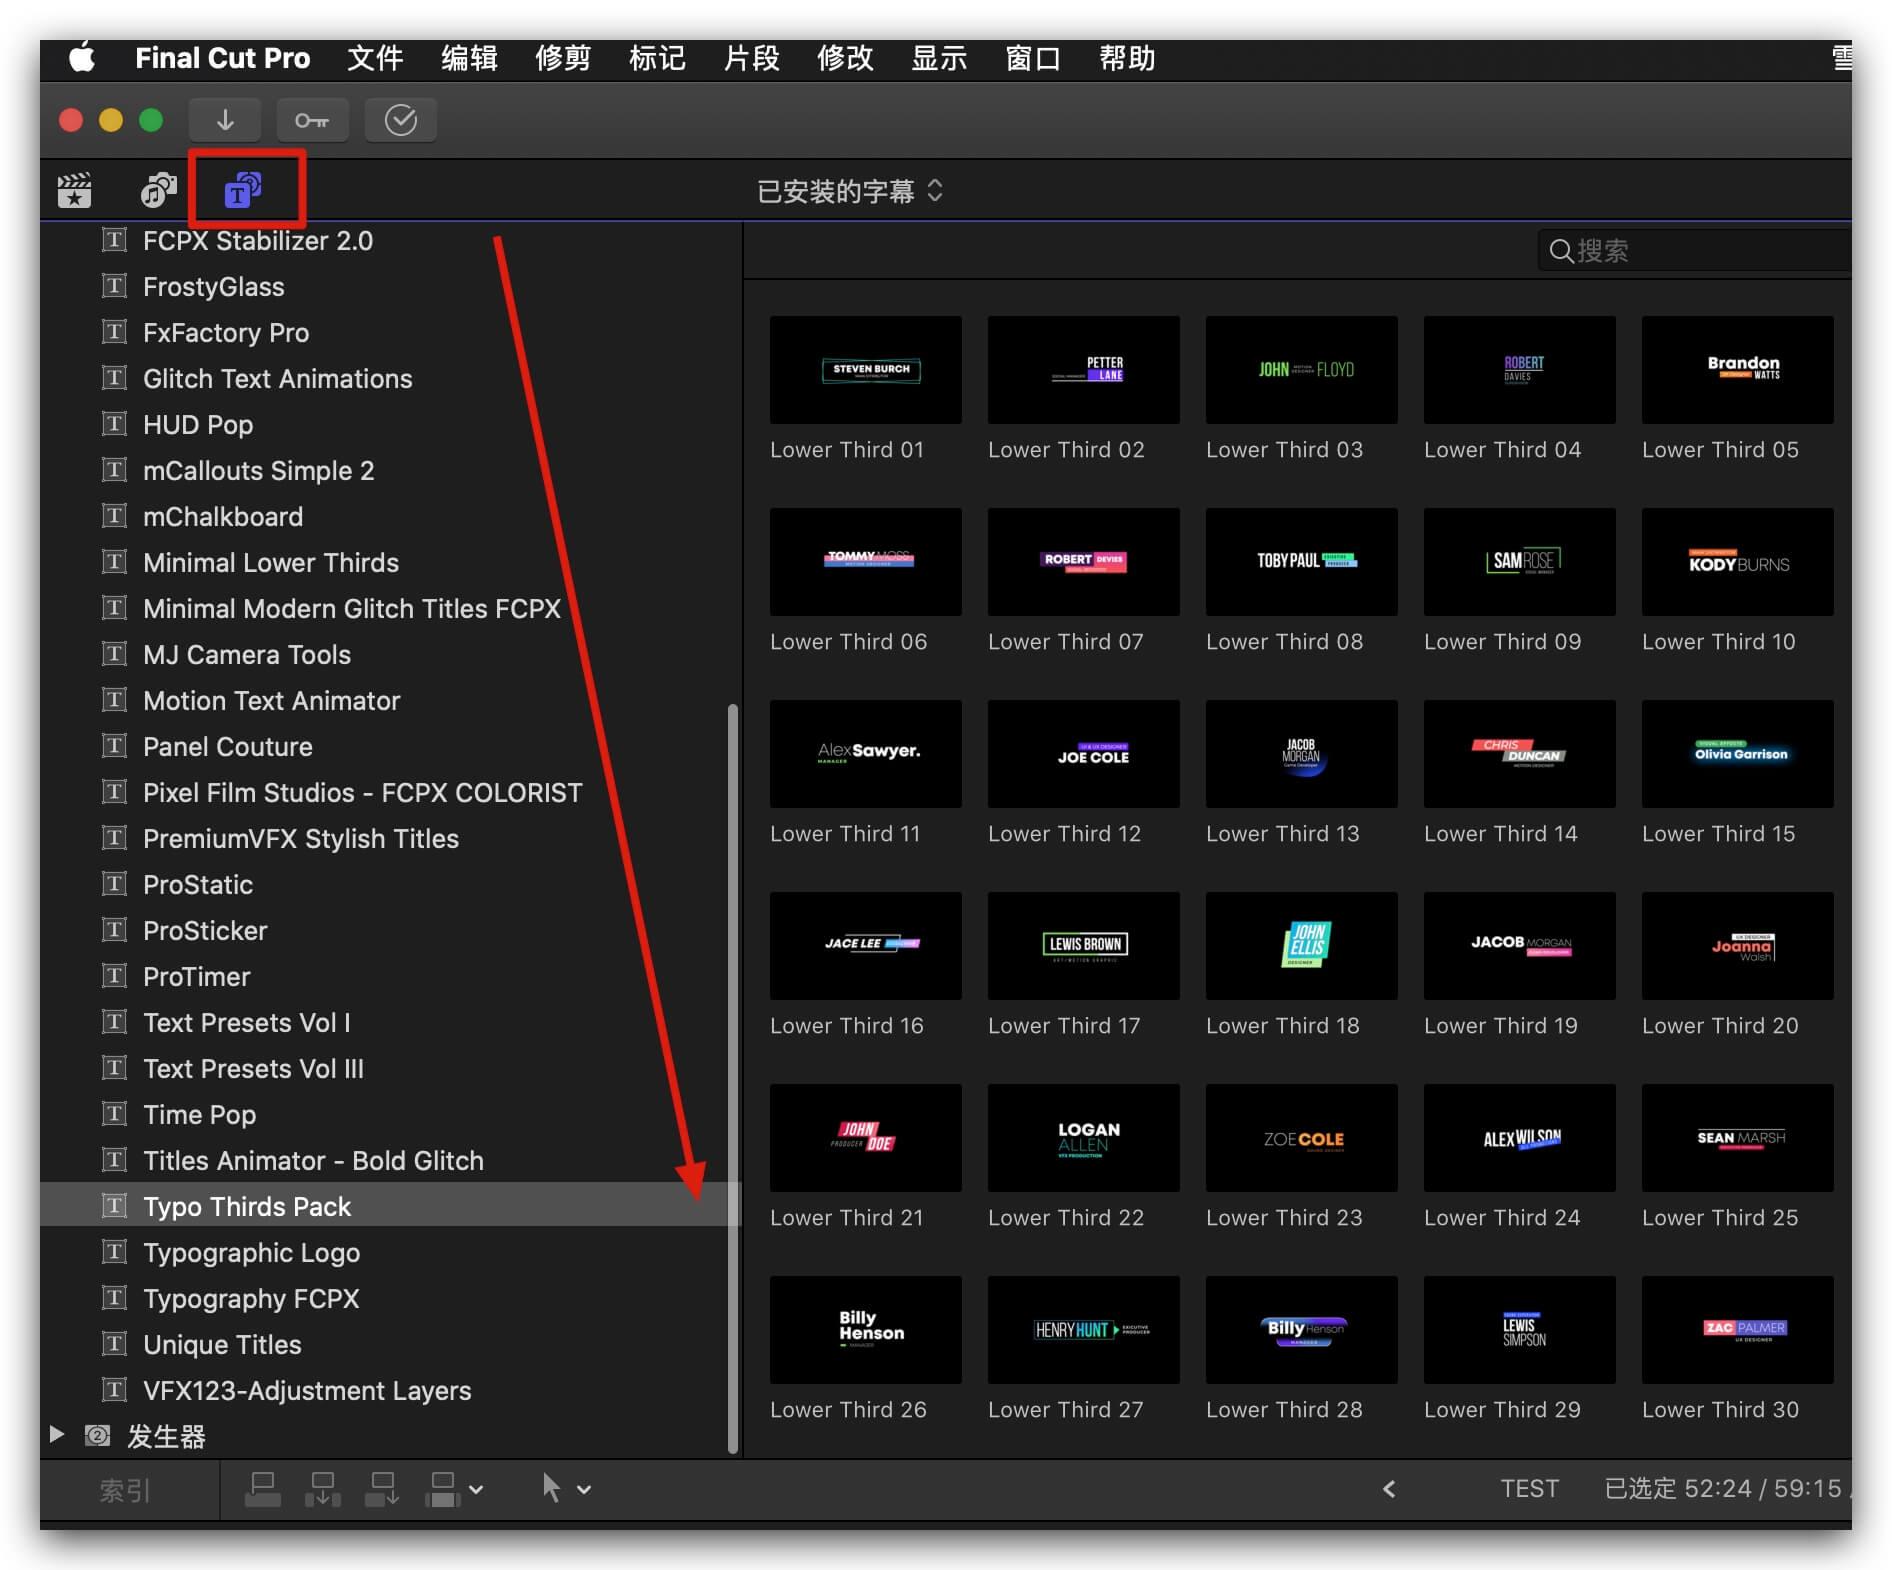 FCPX插件 50个现代彩色文字标题字幕条动画预设+使用教程 Typo Thirds